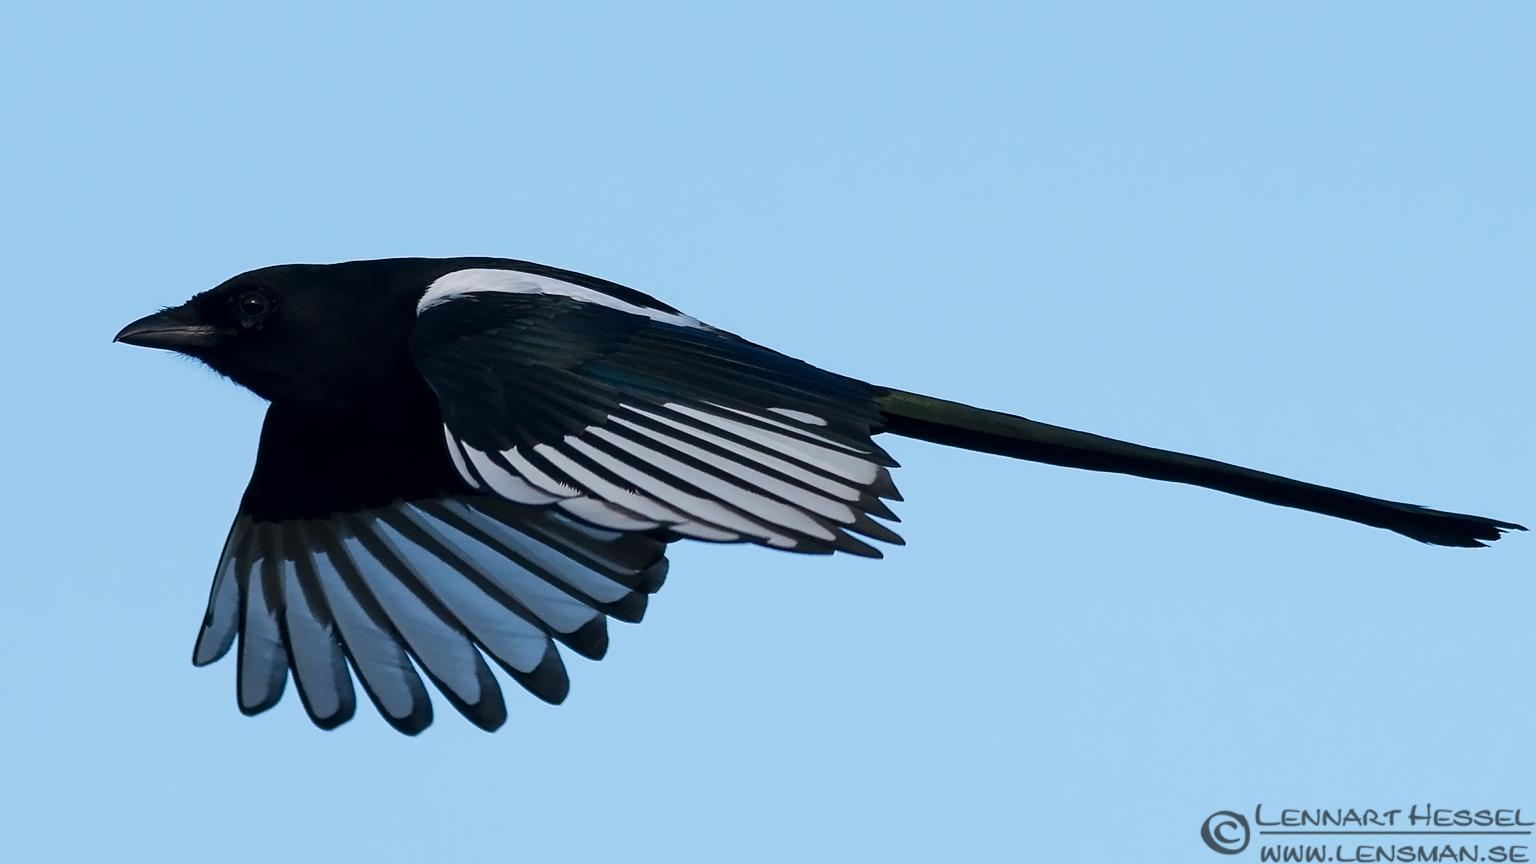 Common Magpie at Brudarebacken